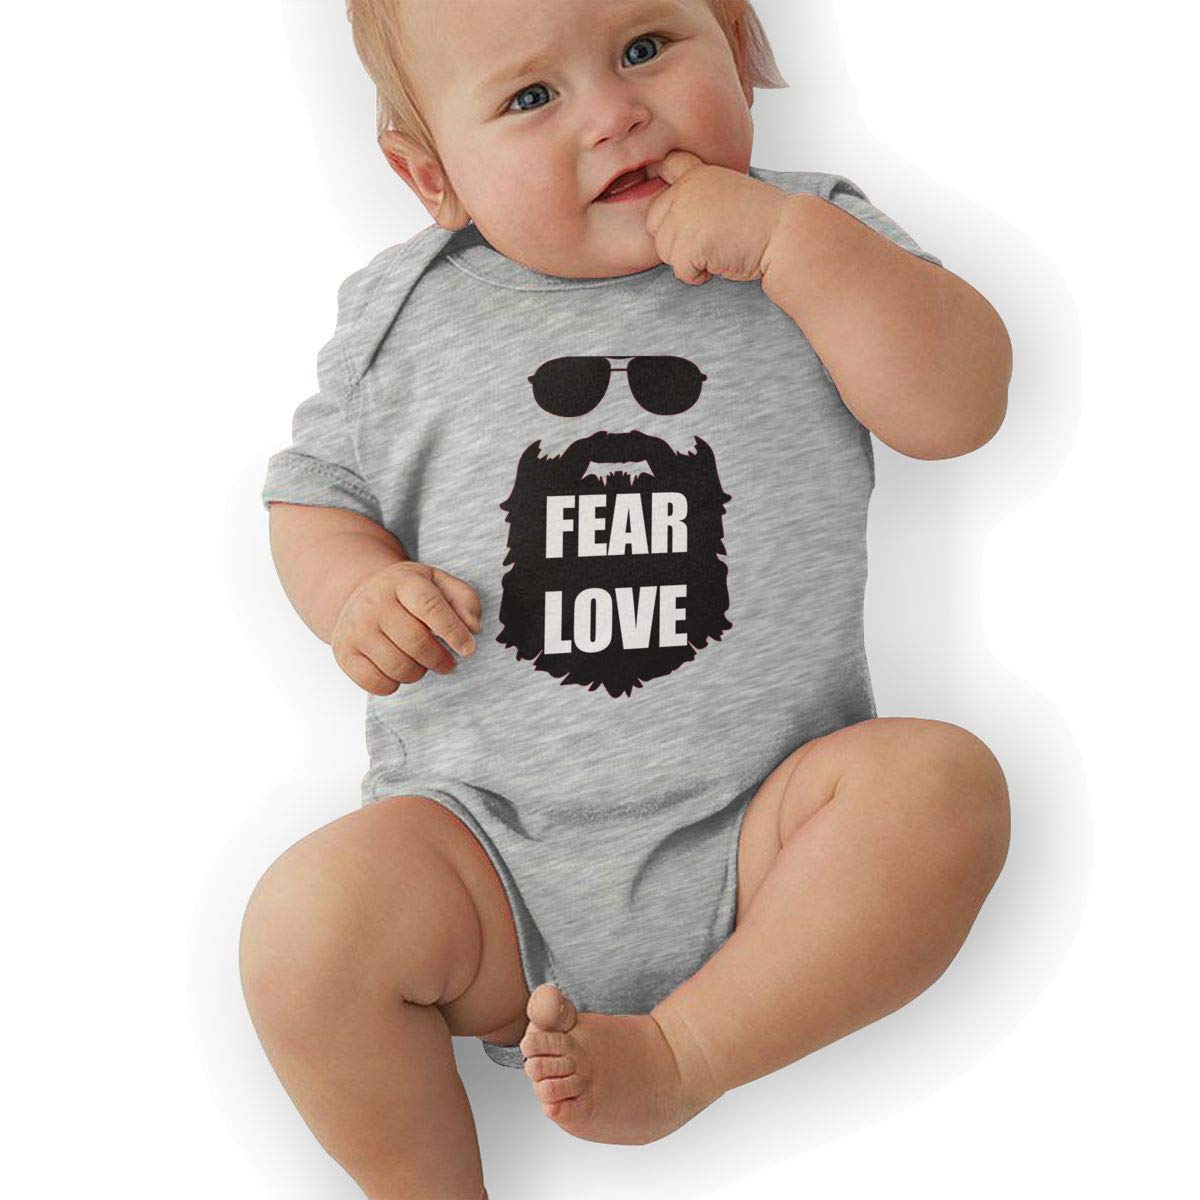 Fear Love Fashion Newborn Baby Short Sleeve Bodysuit Romper Infant Summer Clothing